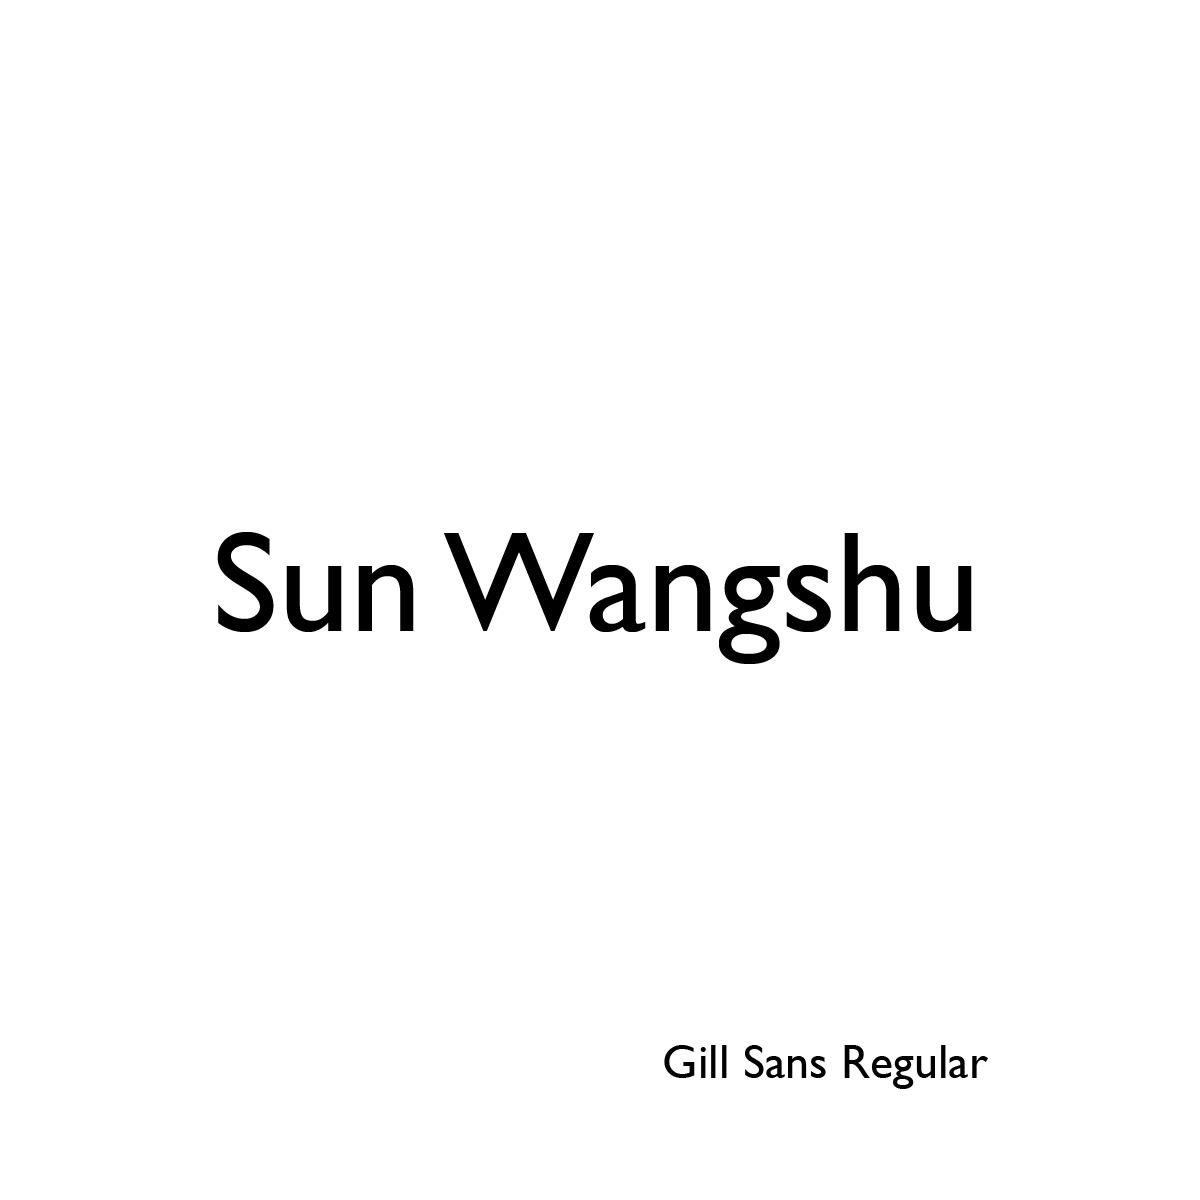 September 2015 – Wangshu Sun